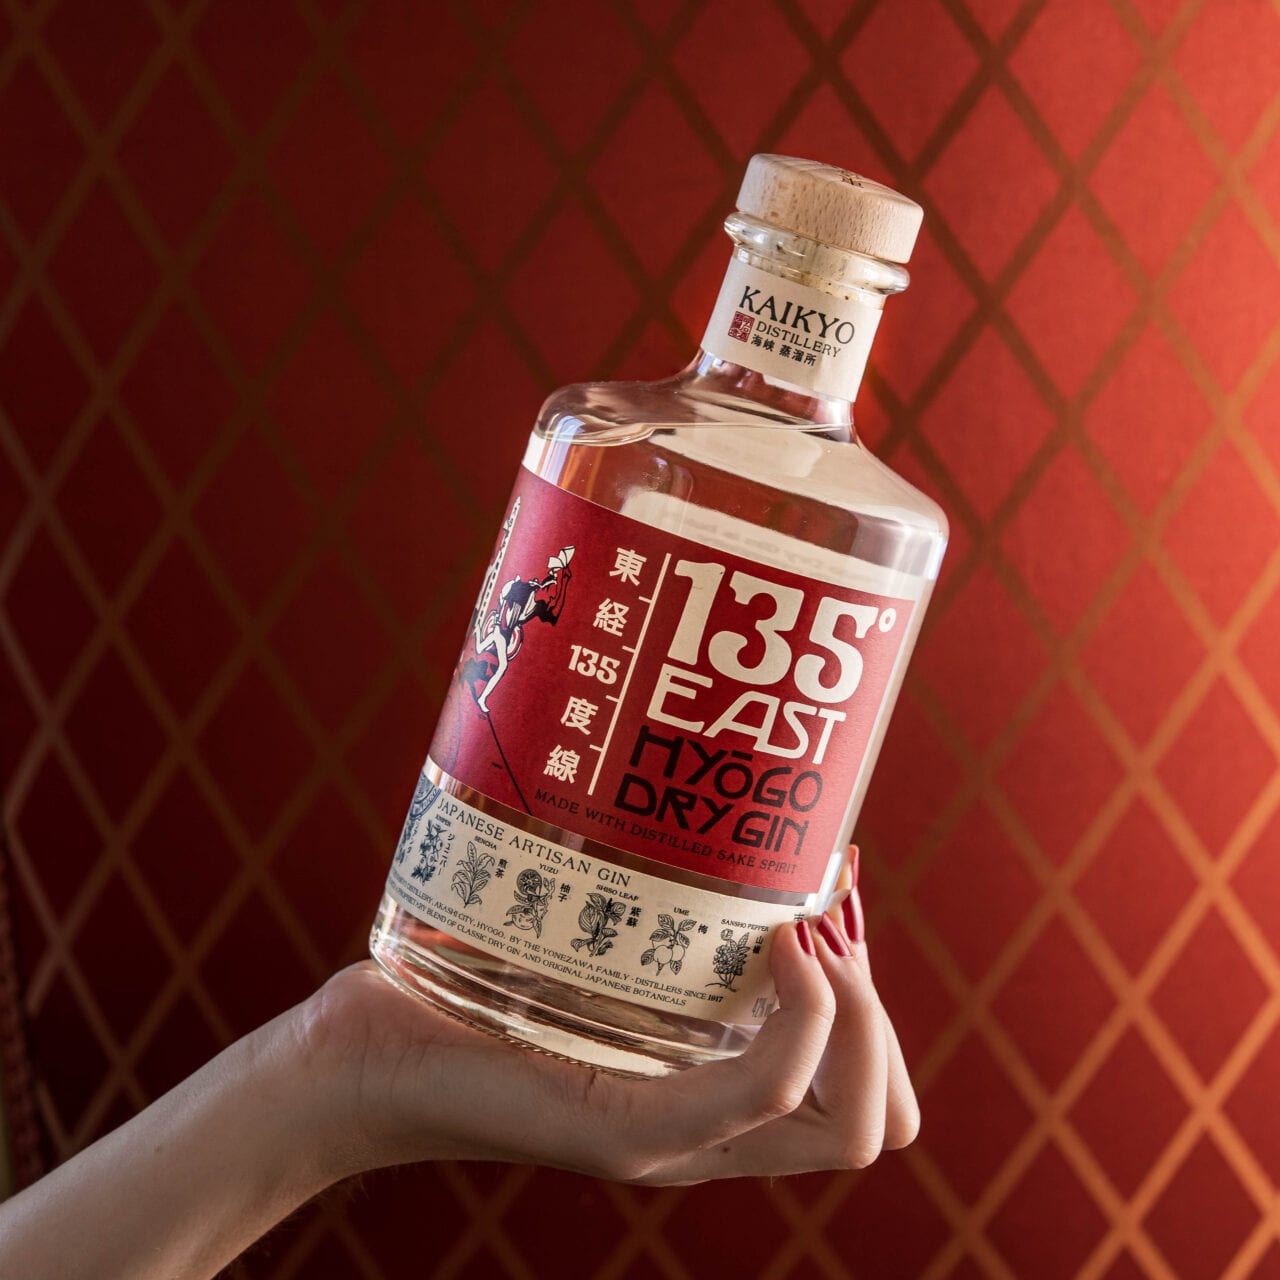 135˚ East Hyōgo Dry Gin bottle in hand